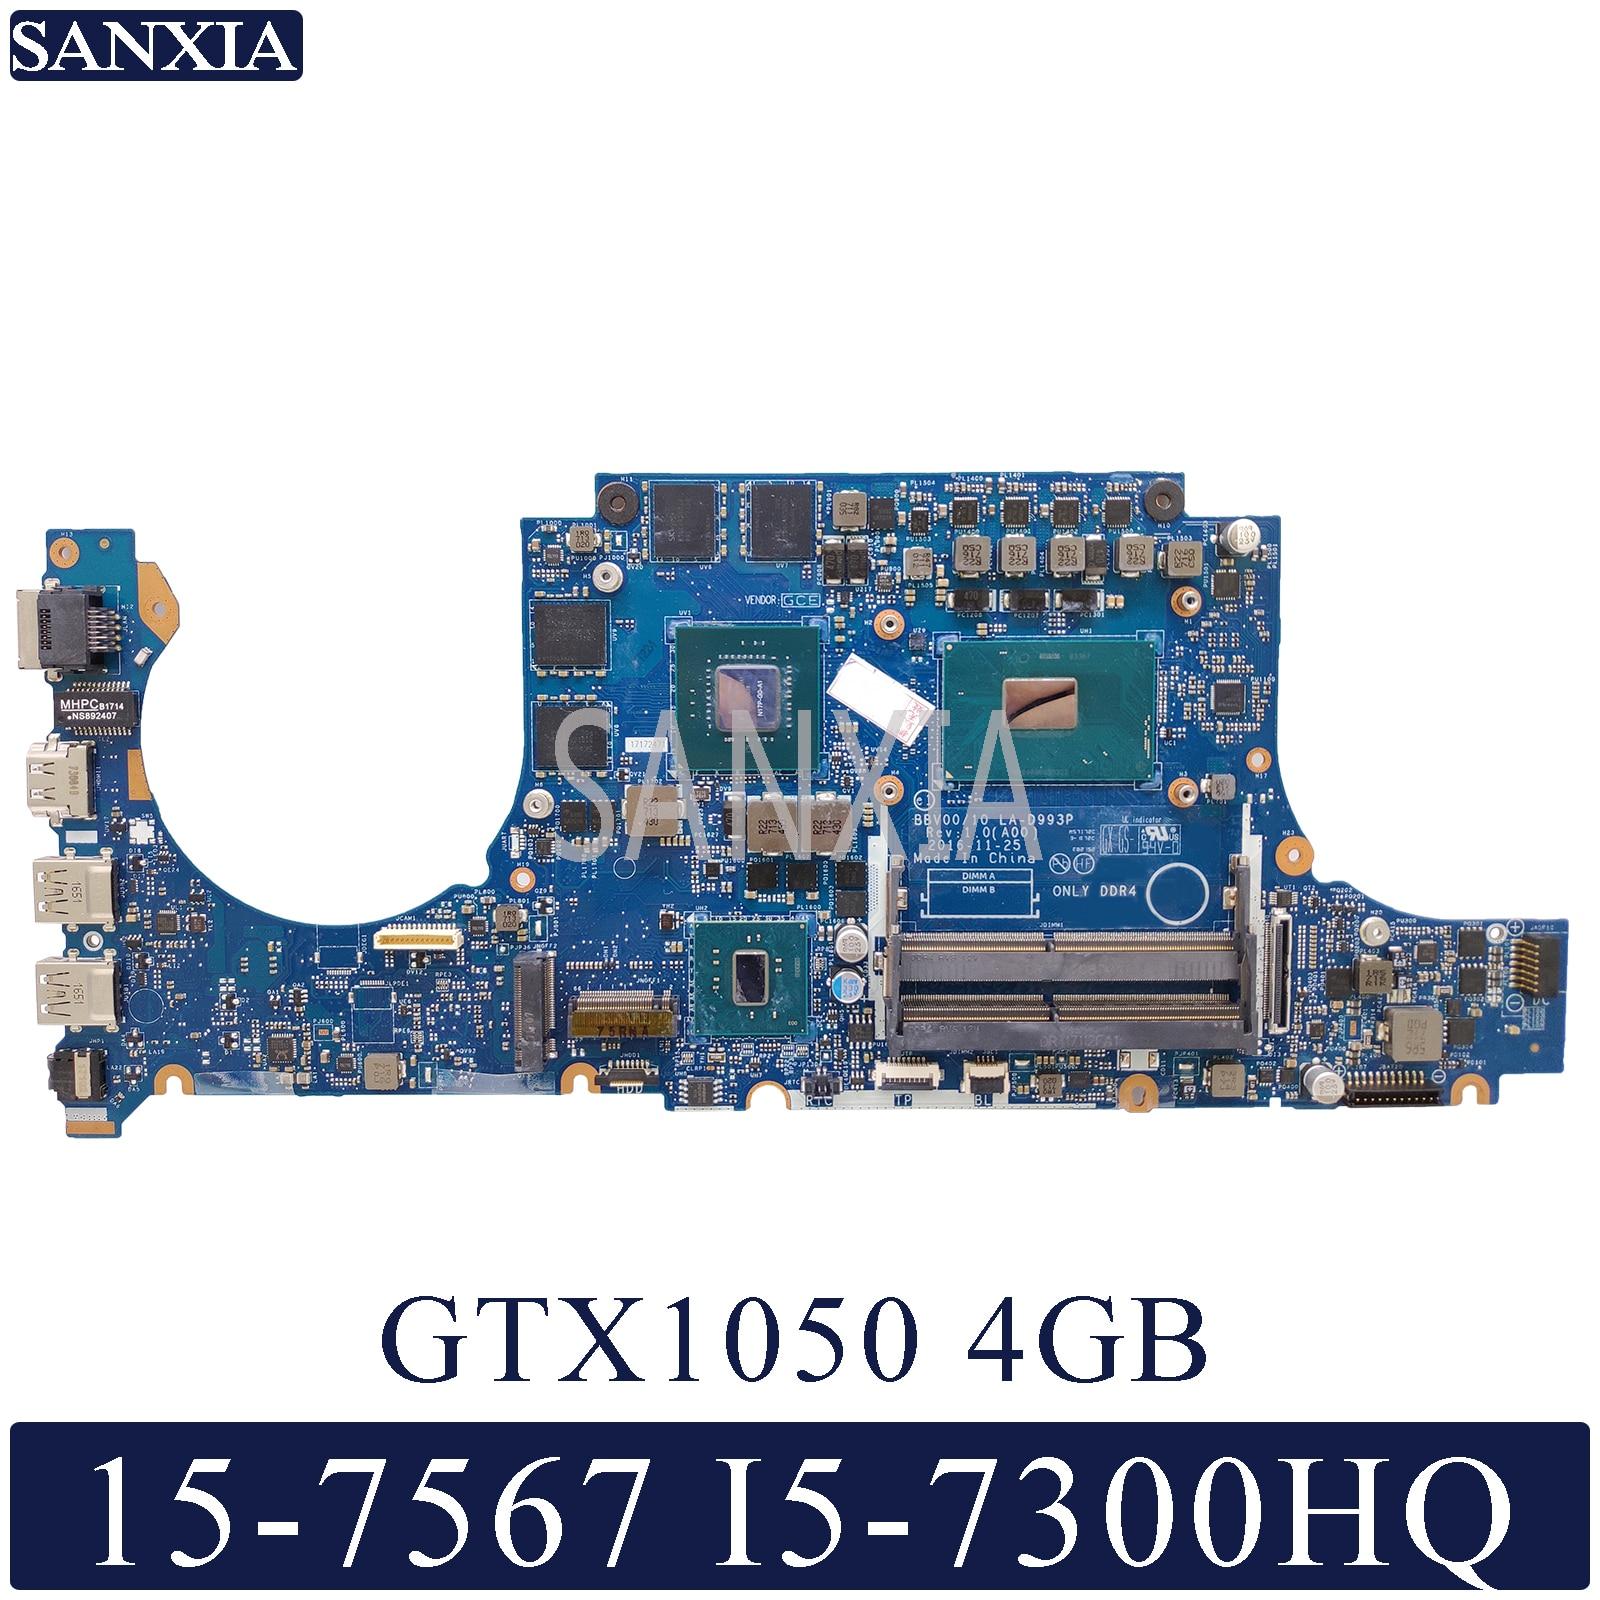 KEFU LA-D993P Laptop Motherboard For Dell Inspiron 15-7567 Original Mainboard I5-7300HQ GTX1050-4GB